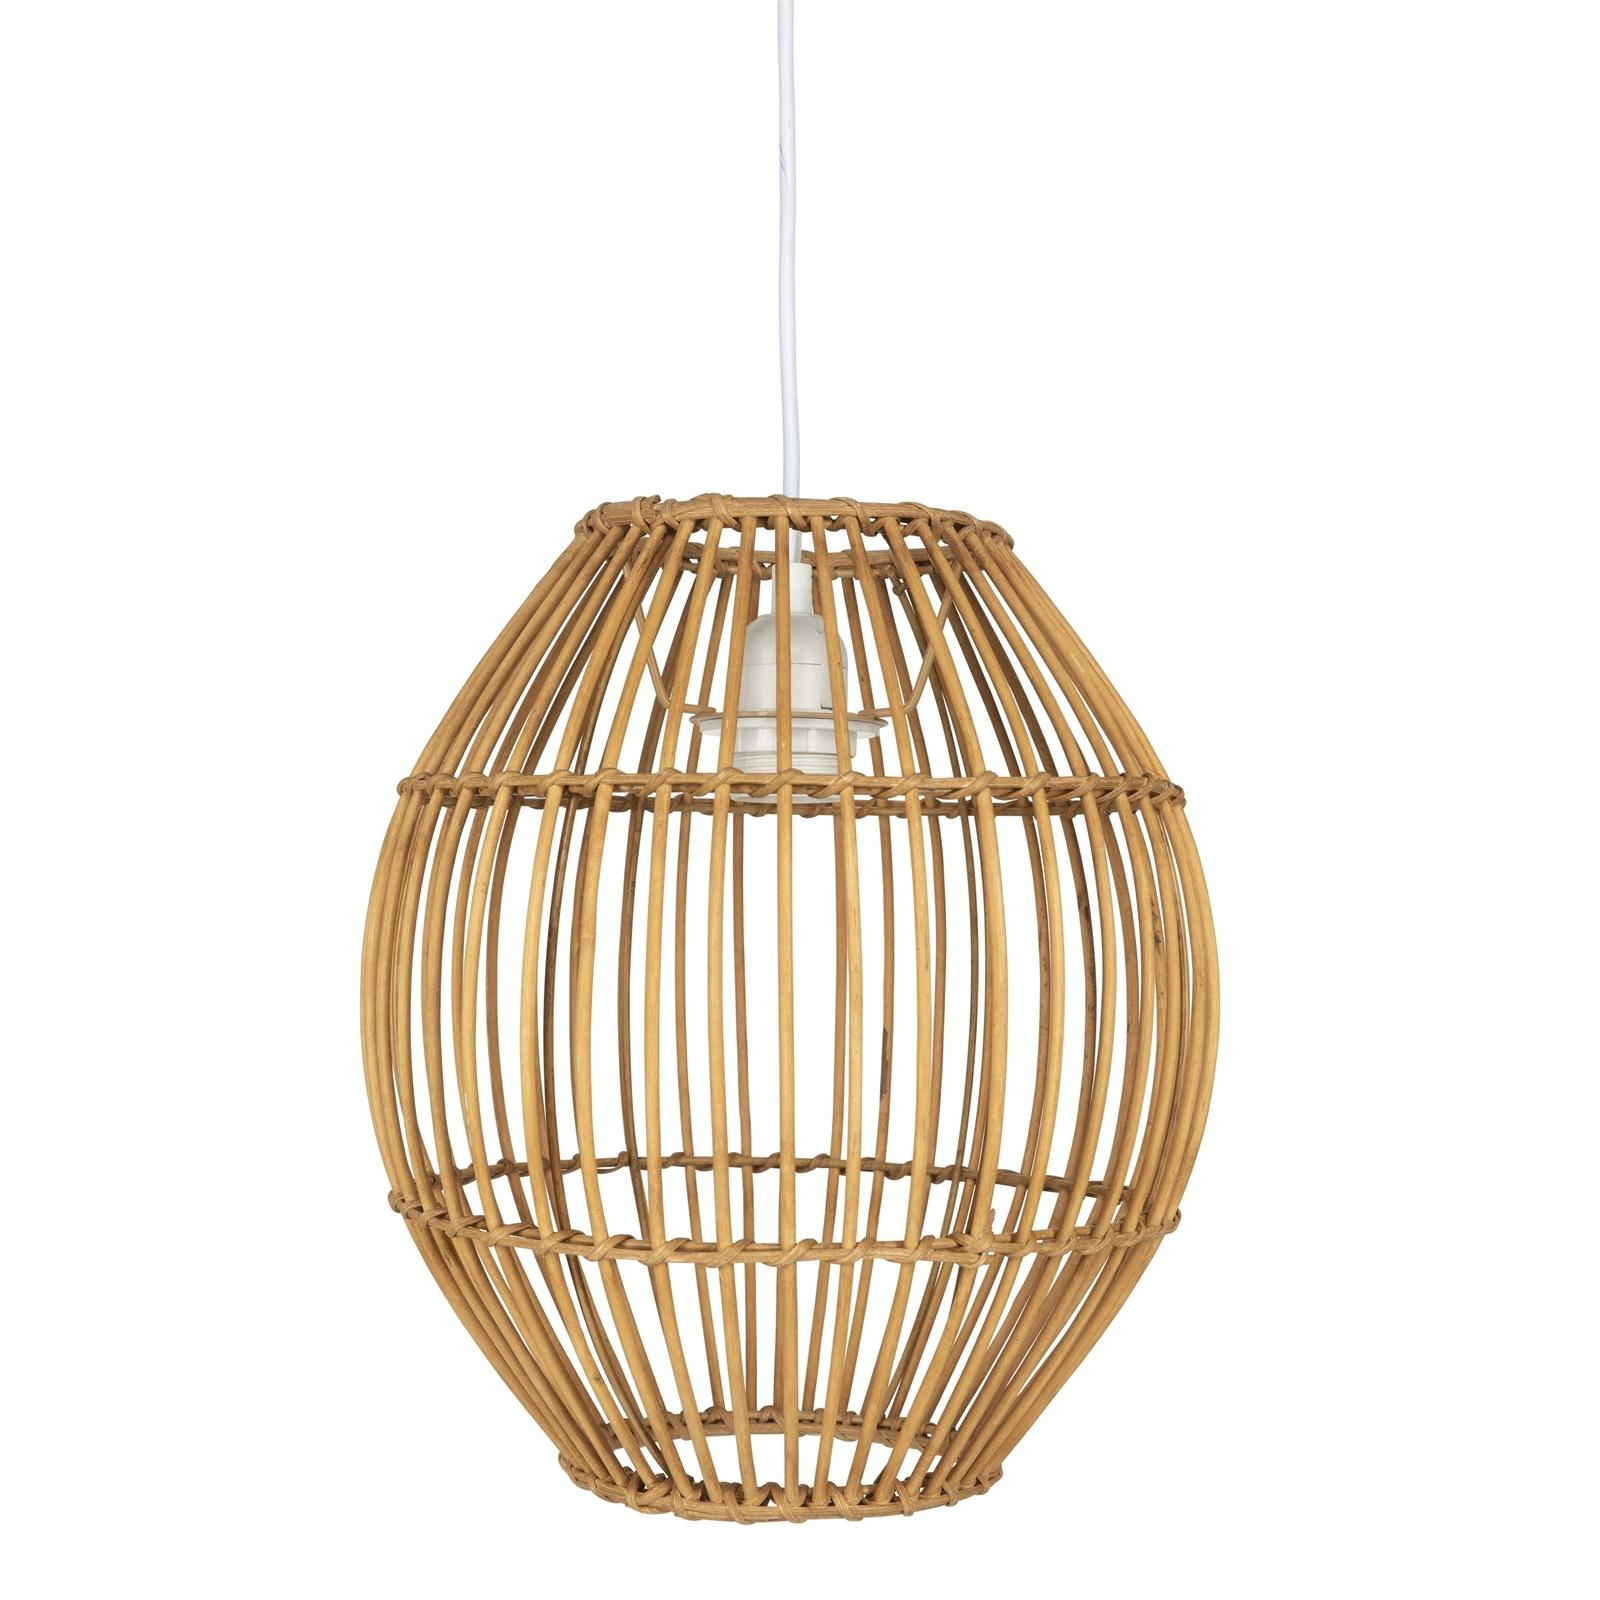 Brilliant Yorkes Bamboo Natural DIY Pendant Light